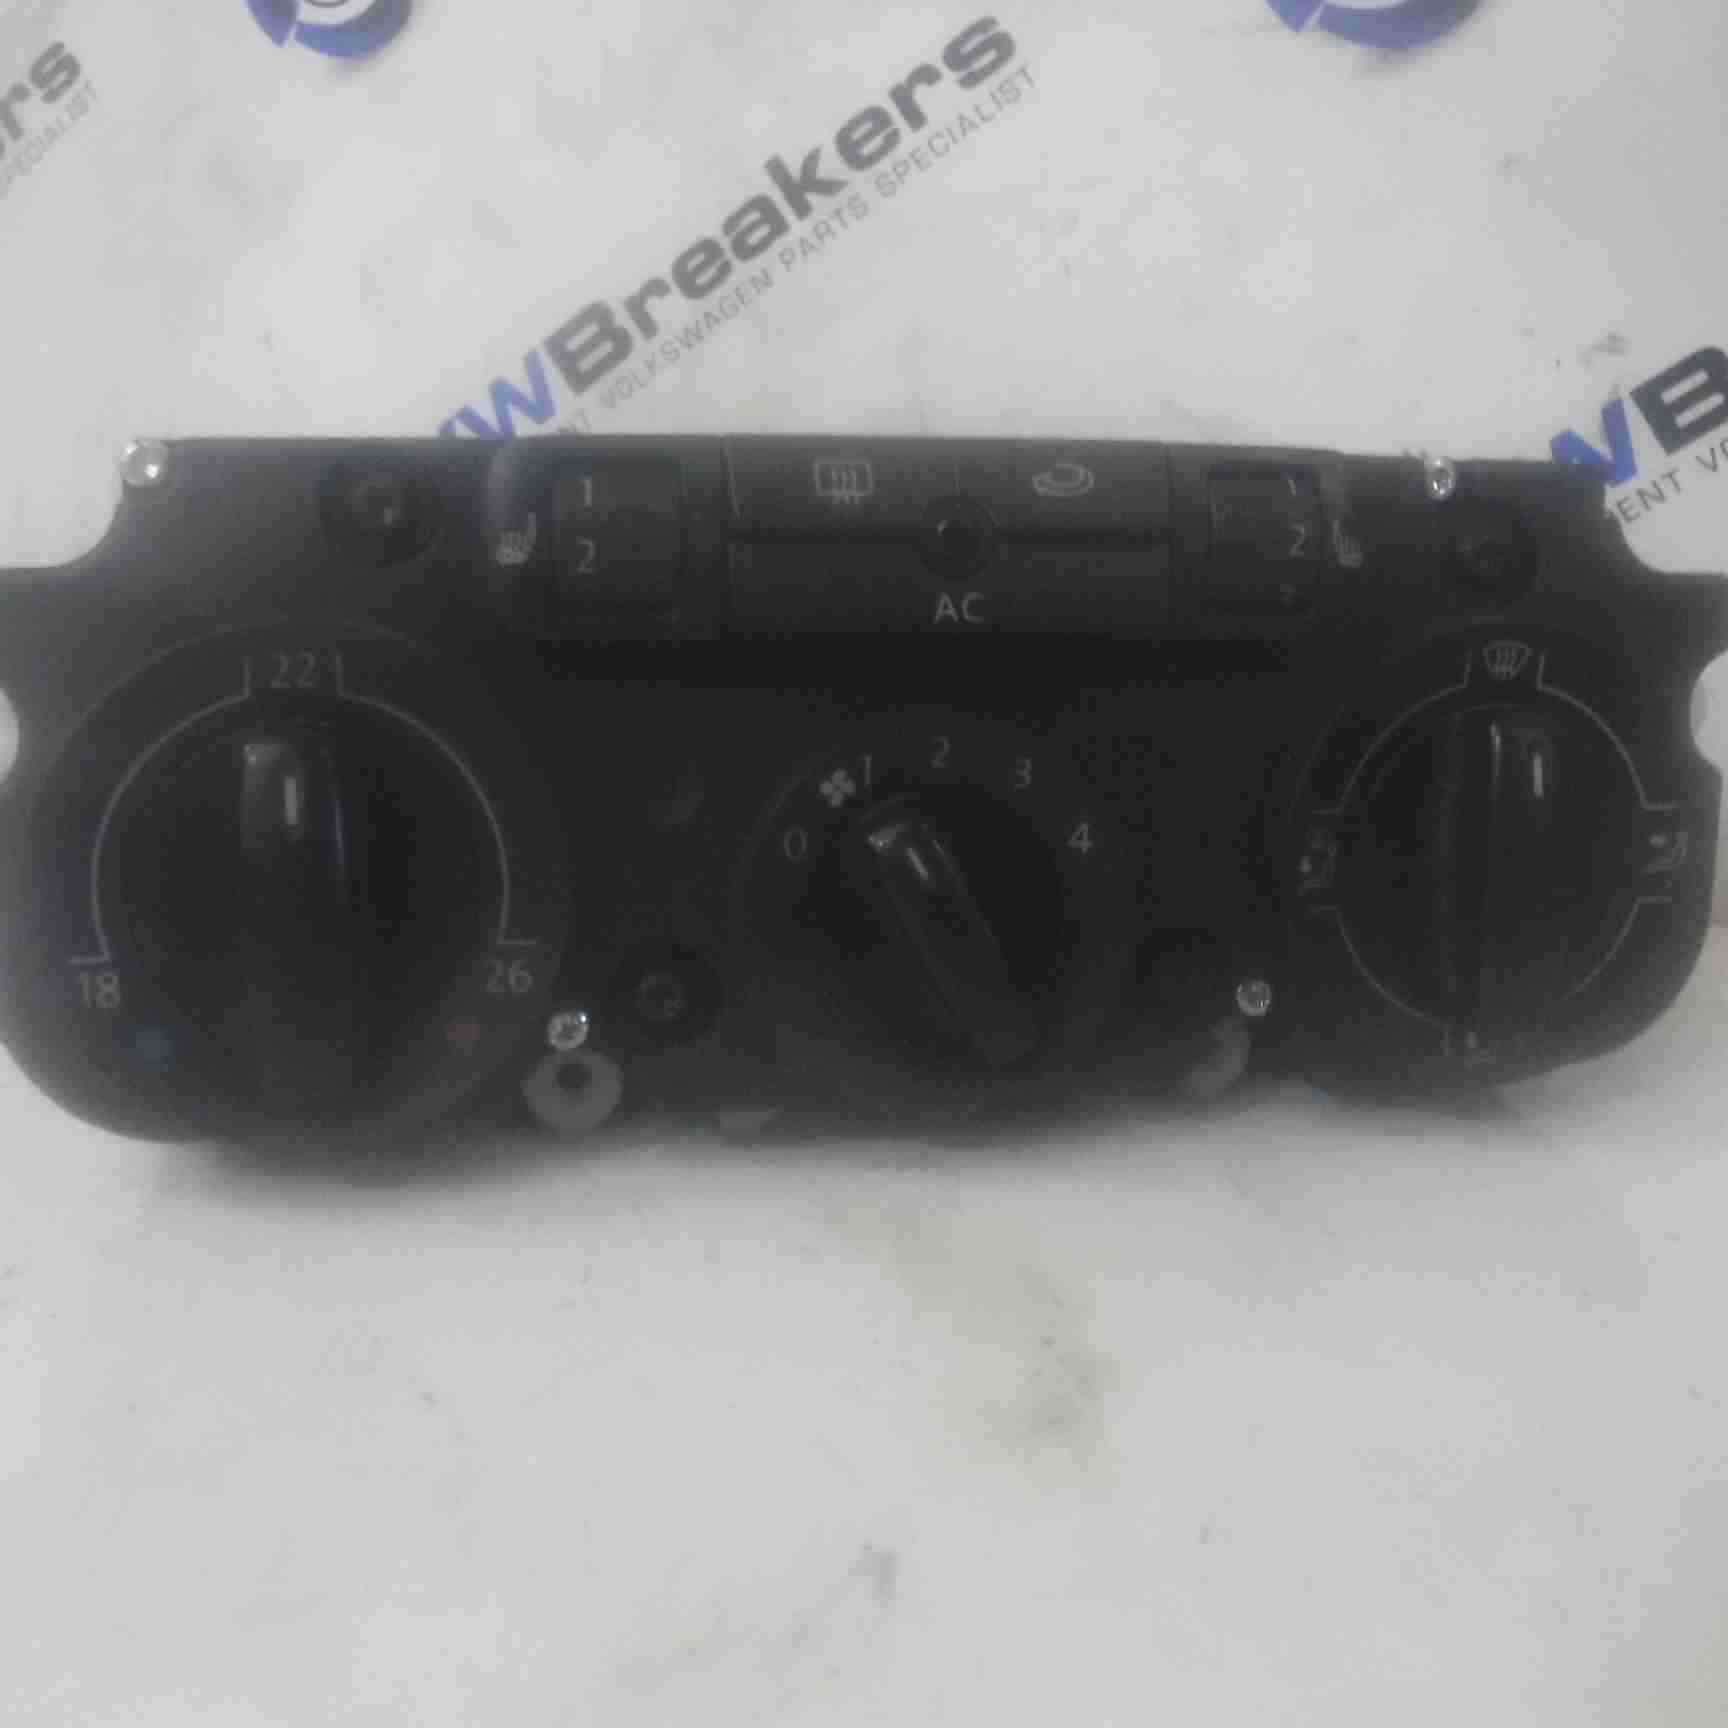 Volkswagen Passat B6 2005-2010 Heater Controls Dials Heated Seats Switches